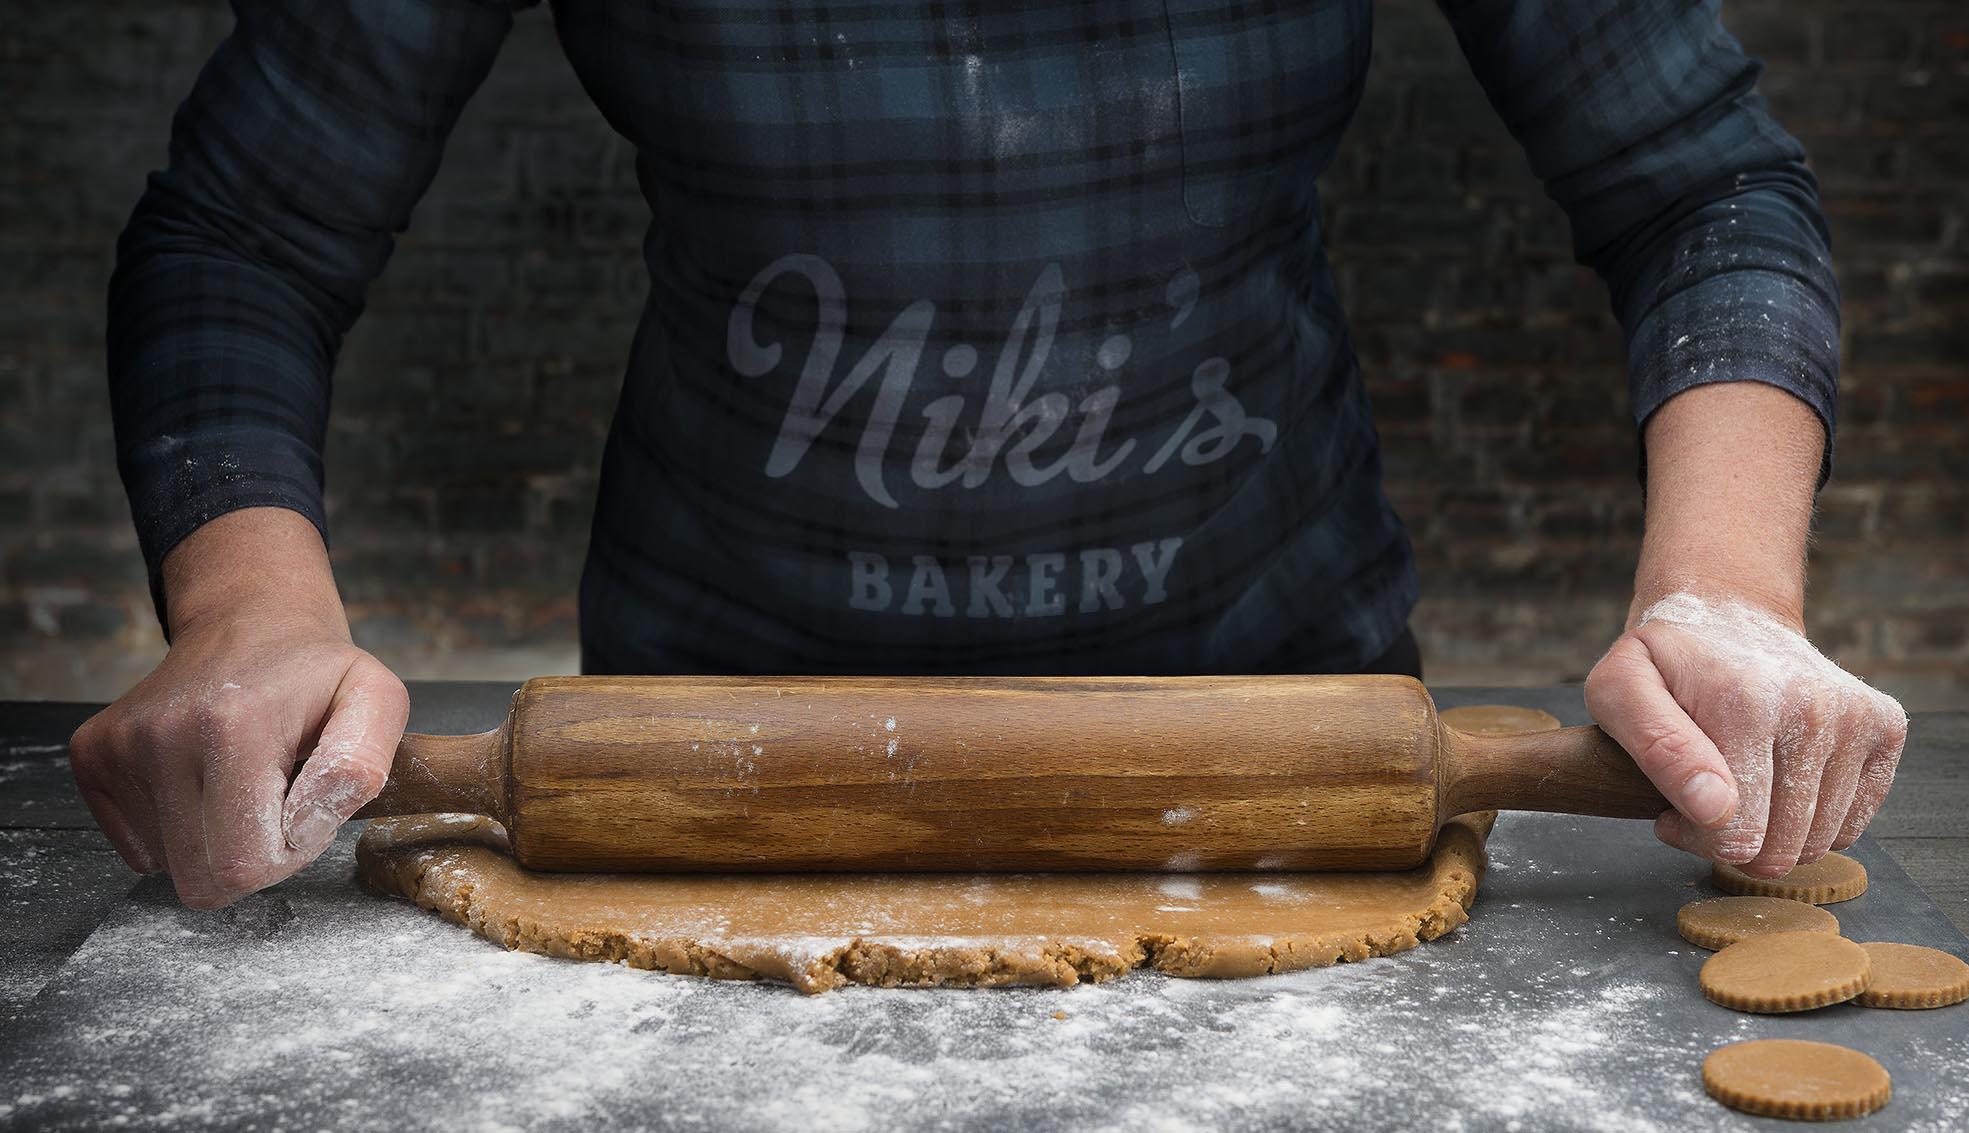 Arthur Los Fotografie - Nikis bakery